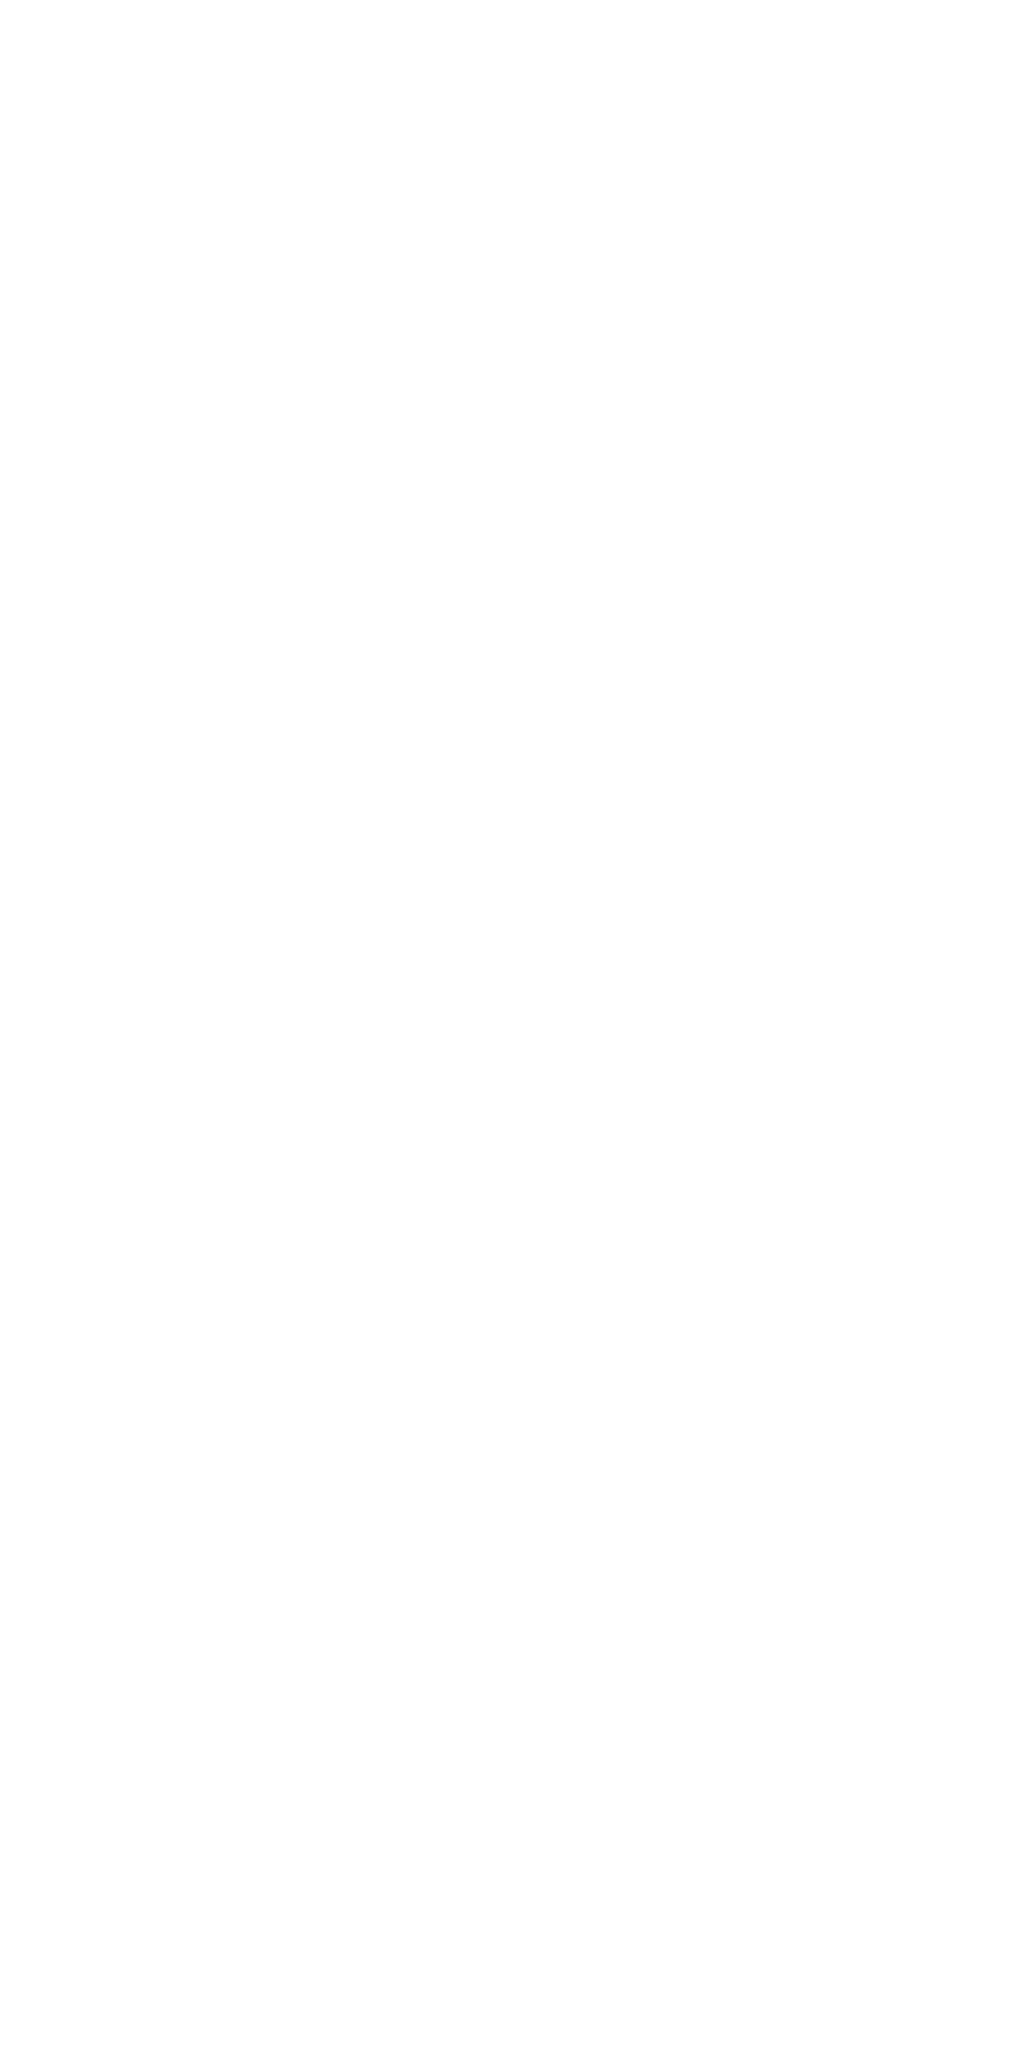 Screenshot from Vita.mn integration